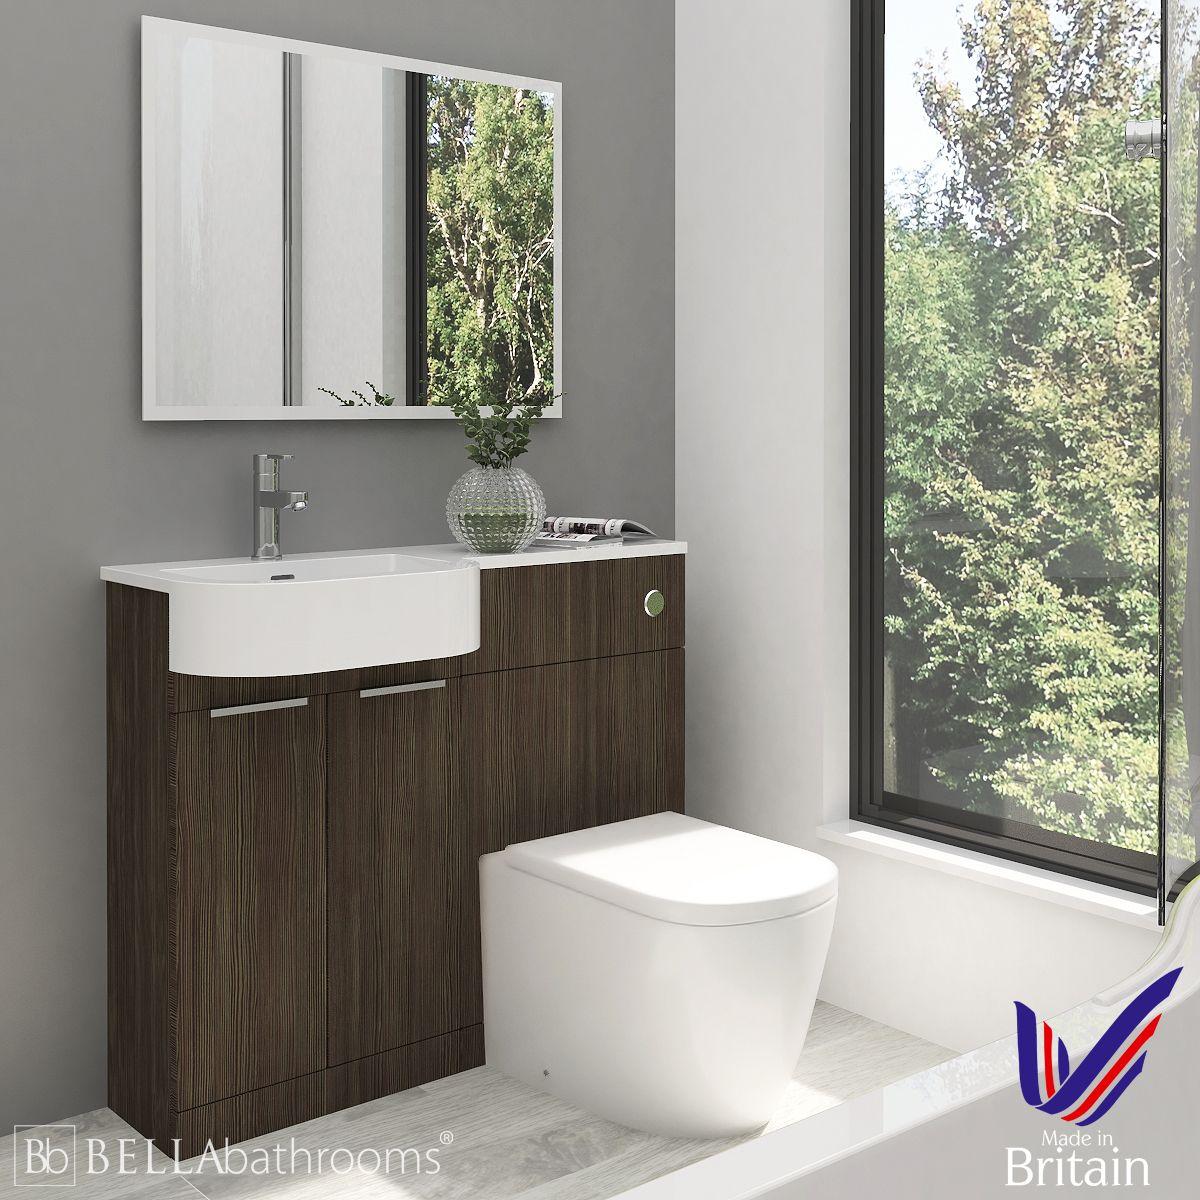 Elation Combination P Shape Bodega Grey Furniture Pack 1010mm Left Hand with Cayton Toilet